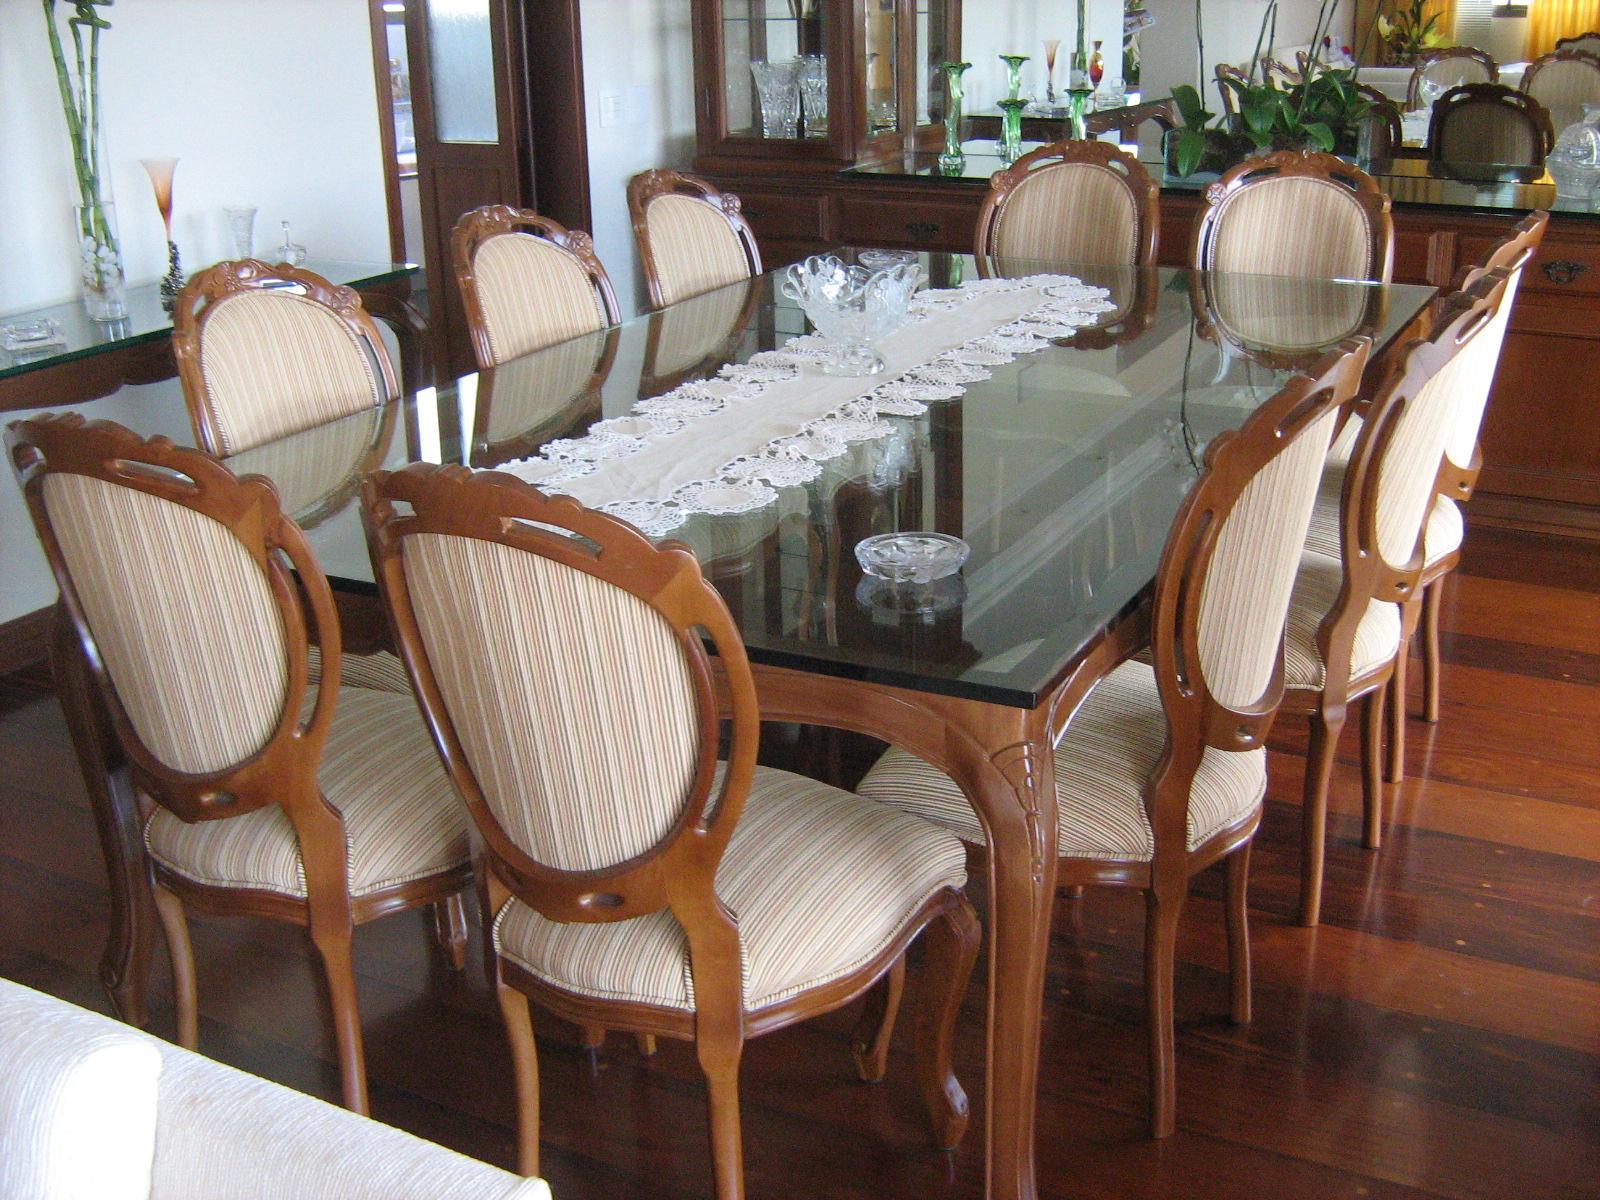 Sala De Jantar Fabrica ~ Sala de Jantar,cadeira jantar,cadeiras jantar,cadeiras,fabrica de